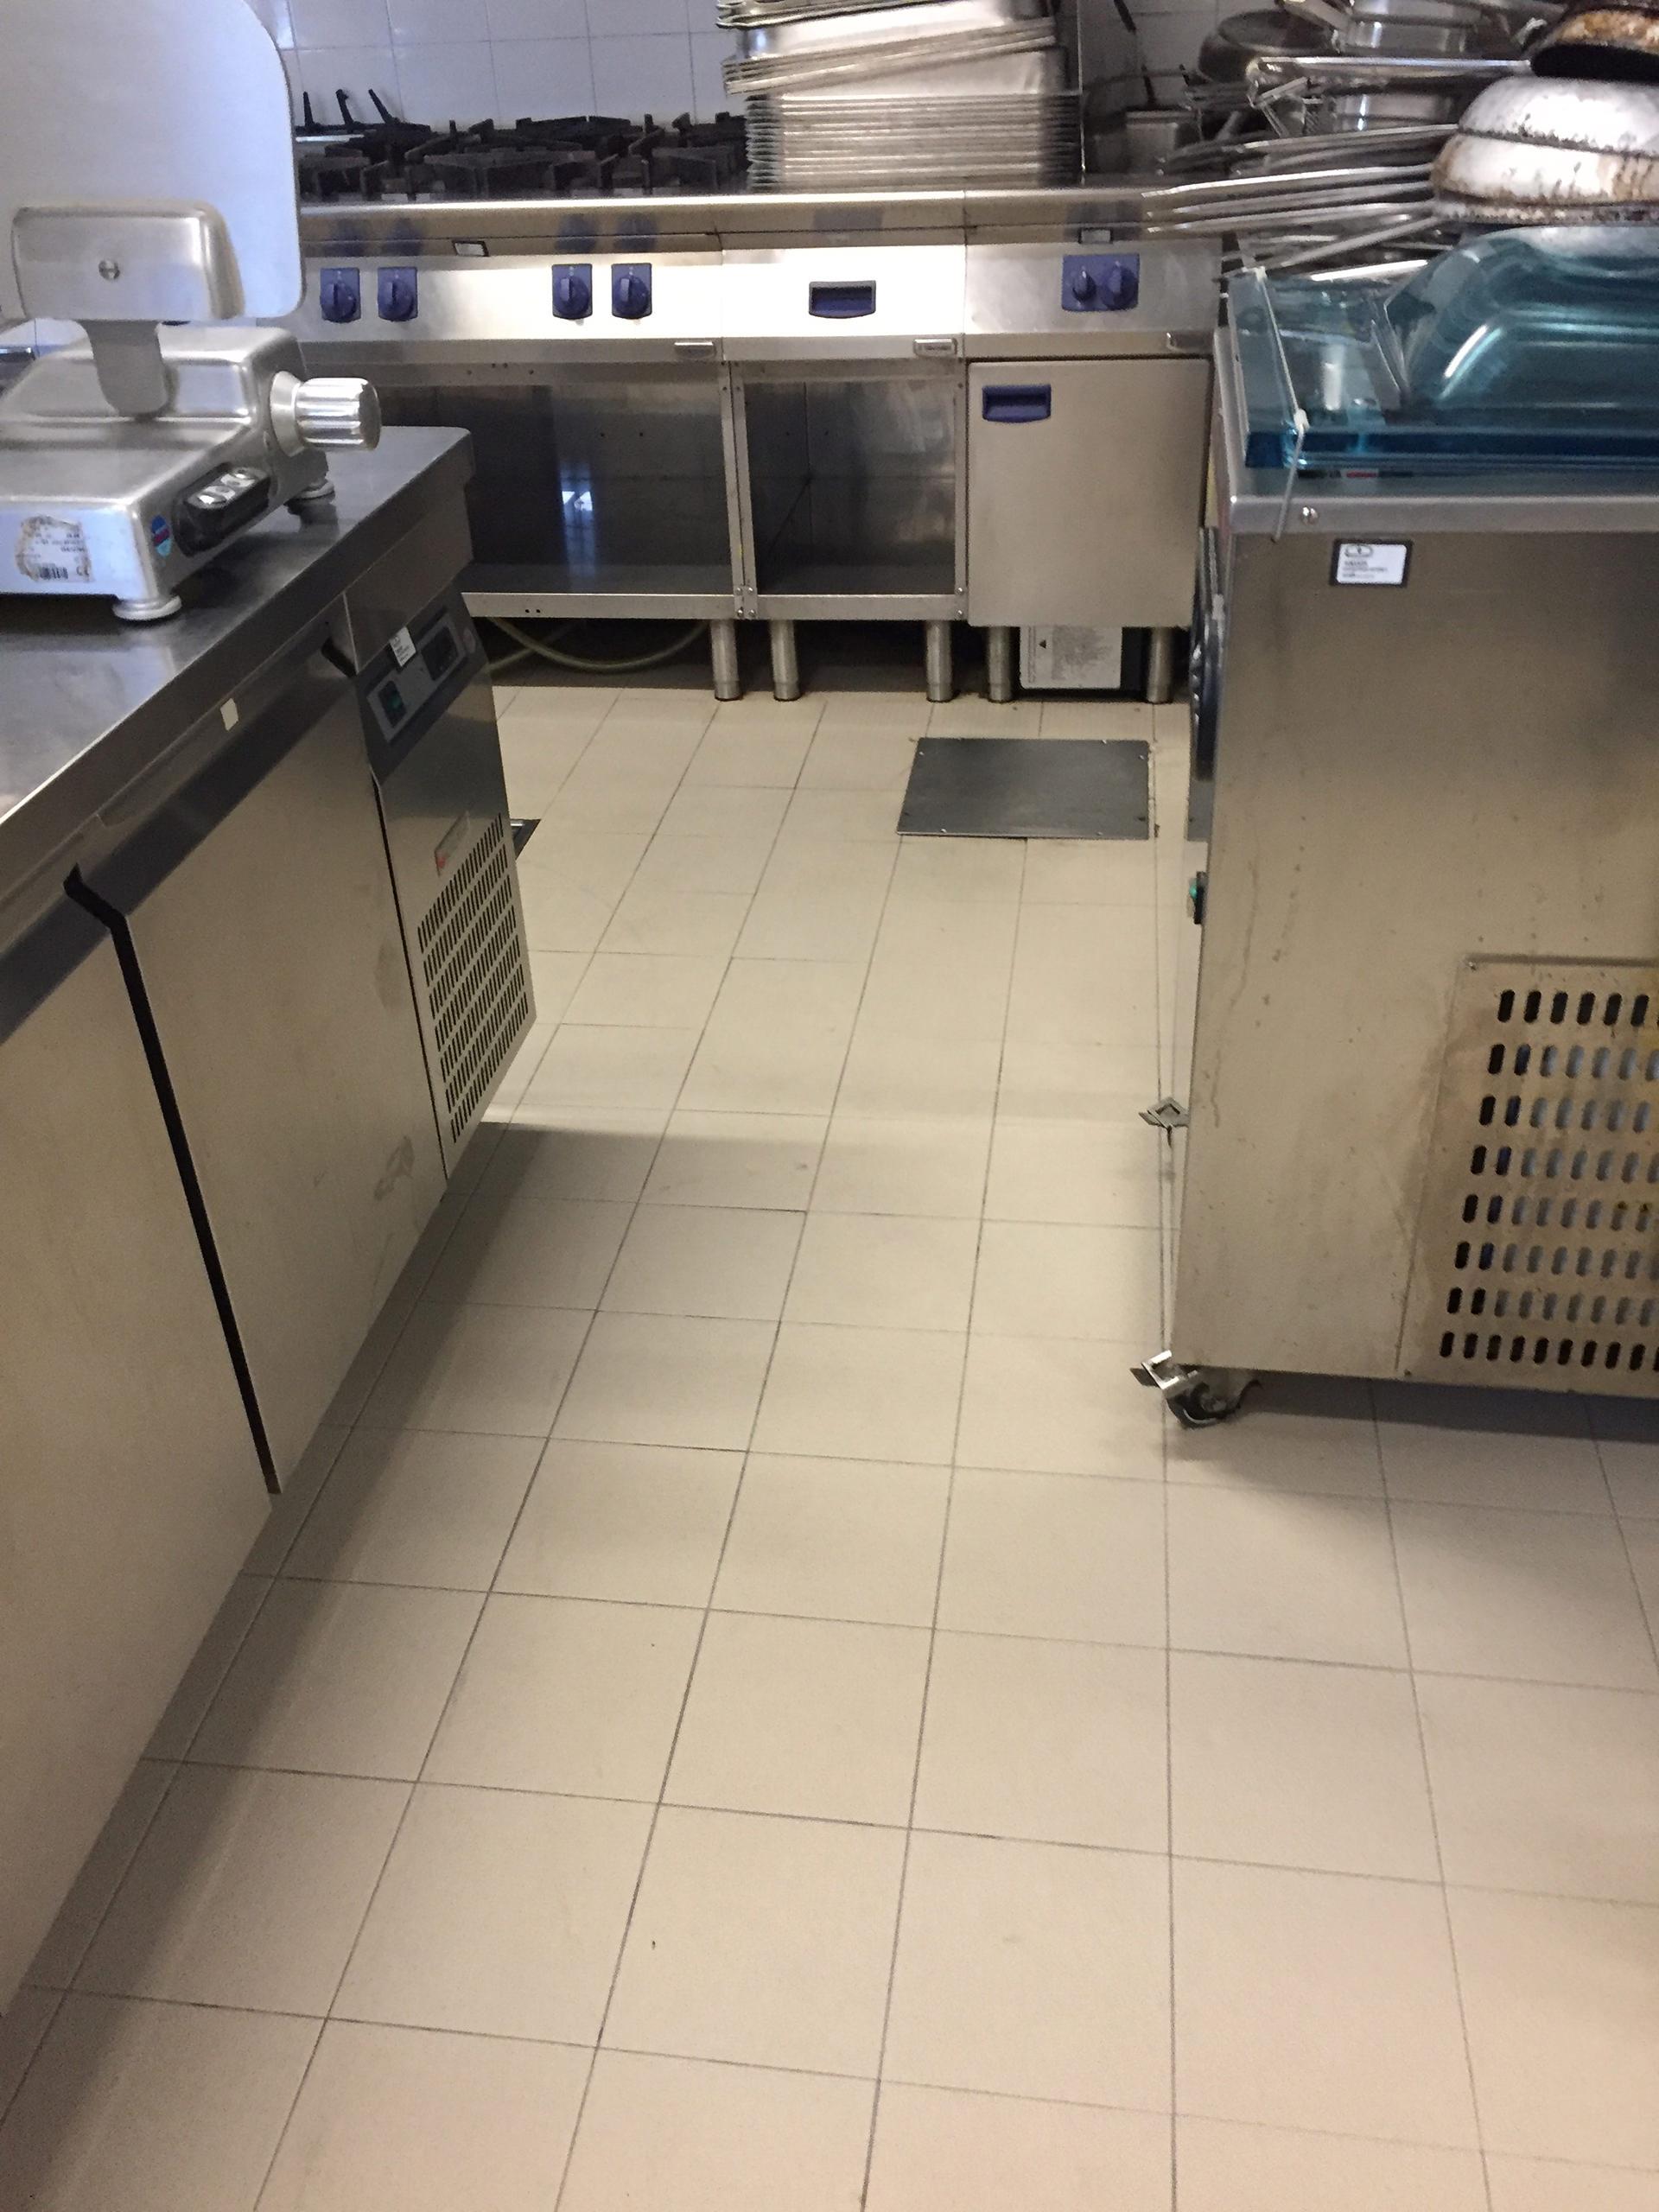 pulizia cucina professionale